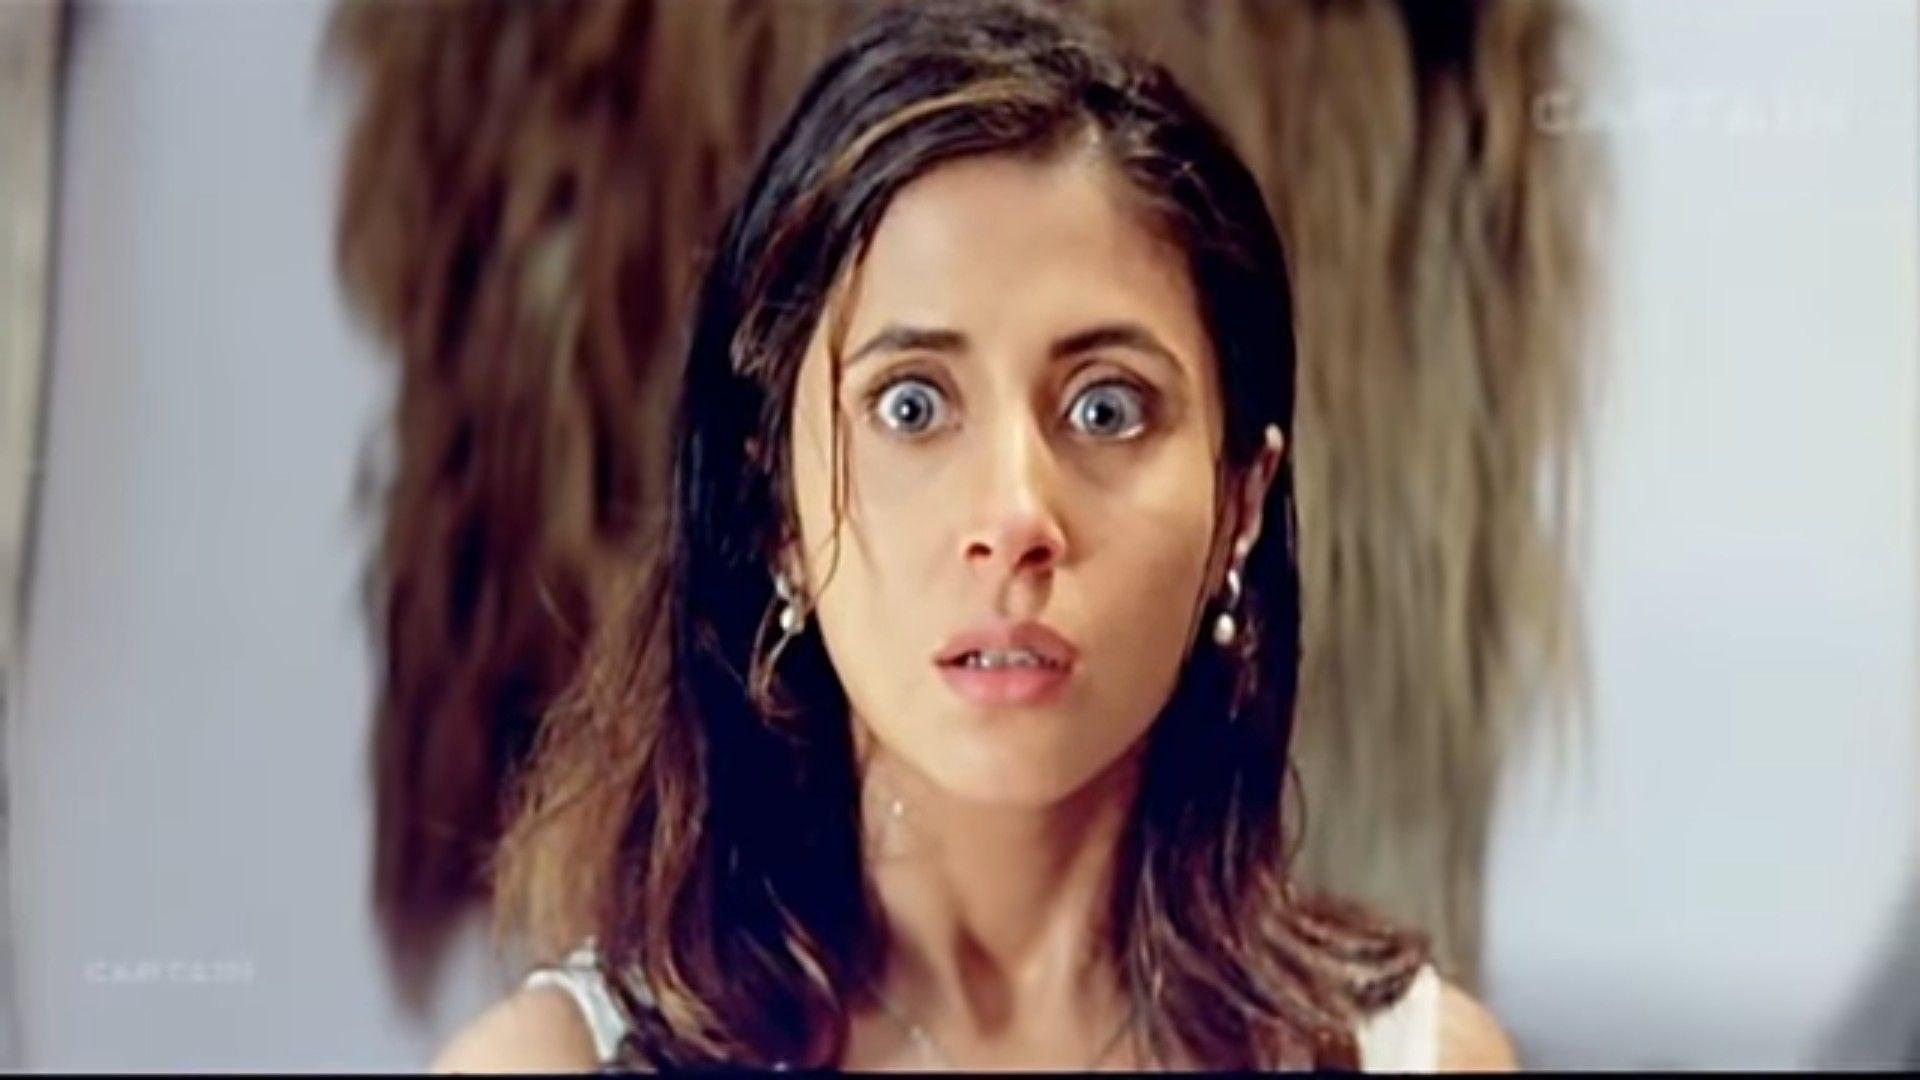 Urmila Matondkar looks shocked in a still from the movie kaun